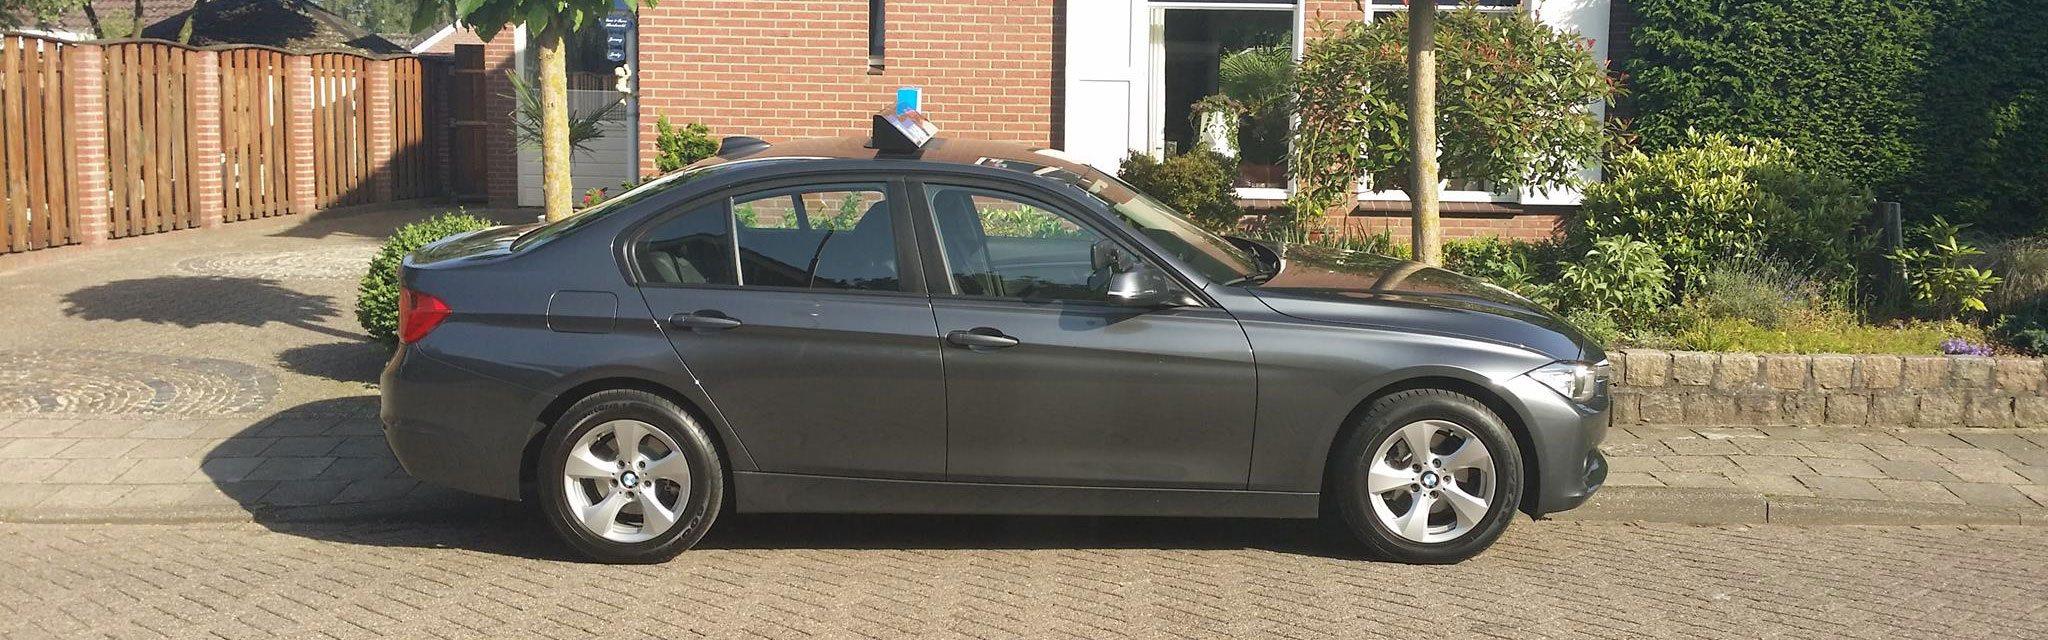 Rijschool Luco BMW - Silvolde, Liemers en Achterhoek